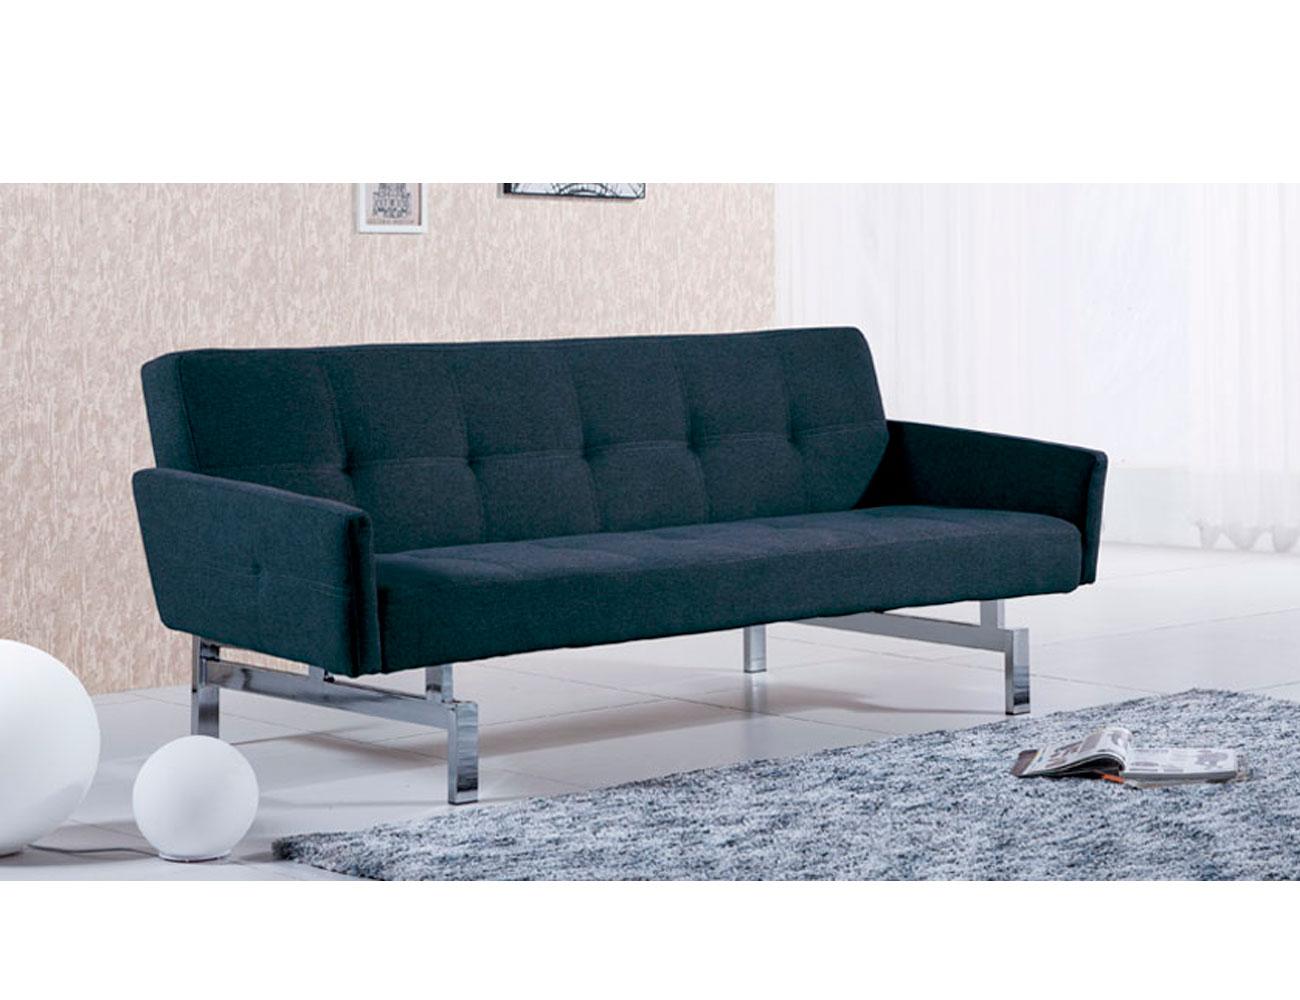 Sofa cama con brazos elegance marengo